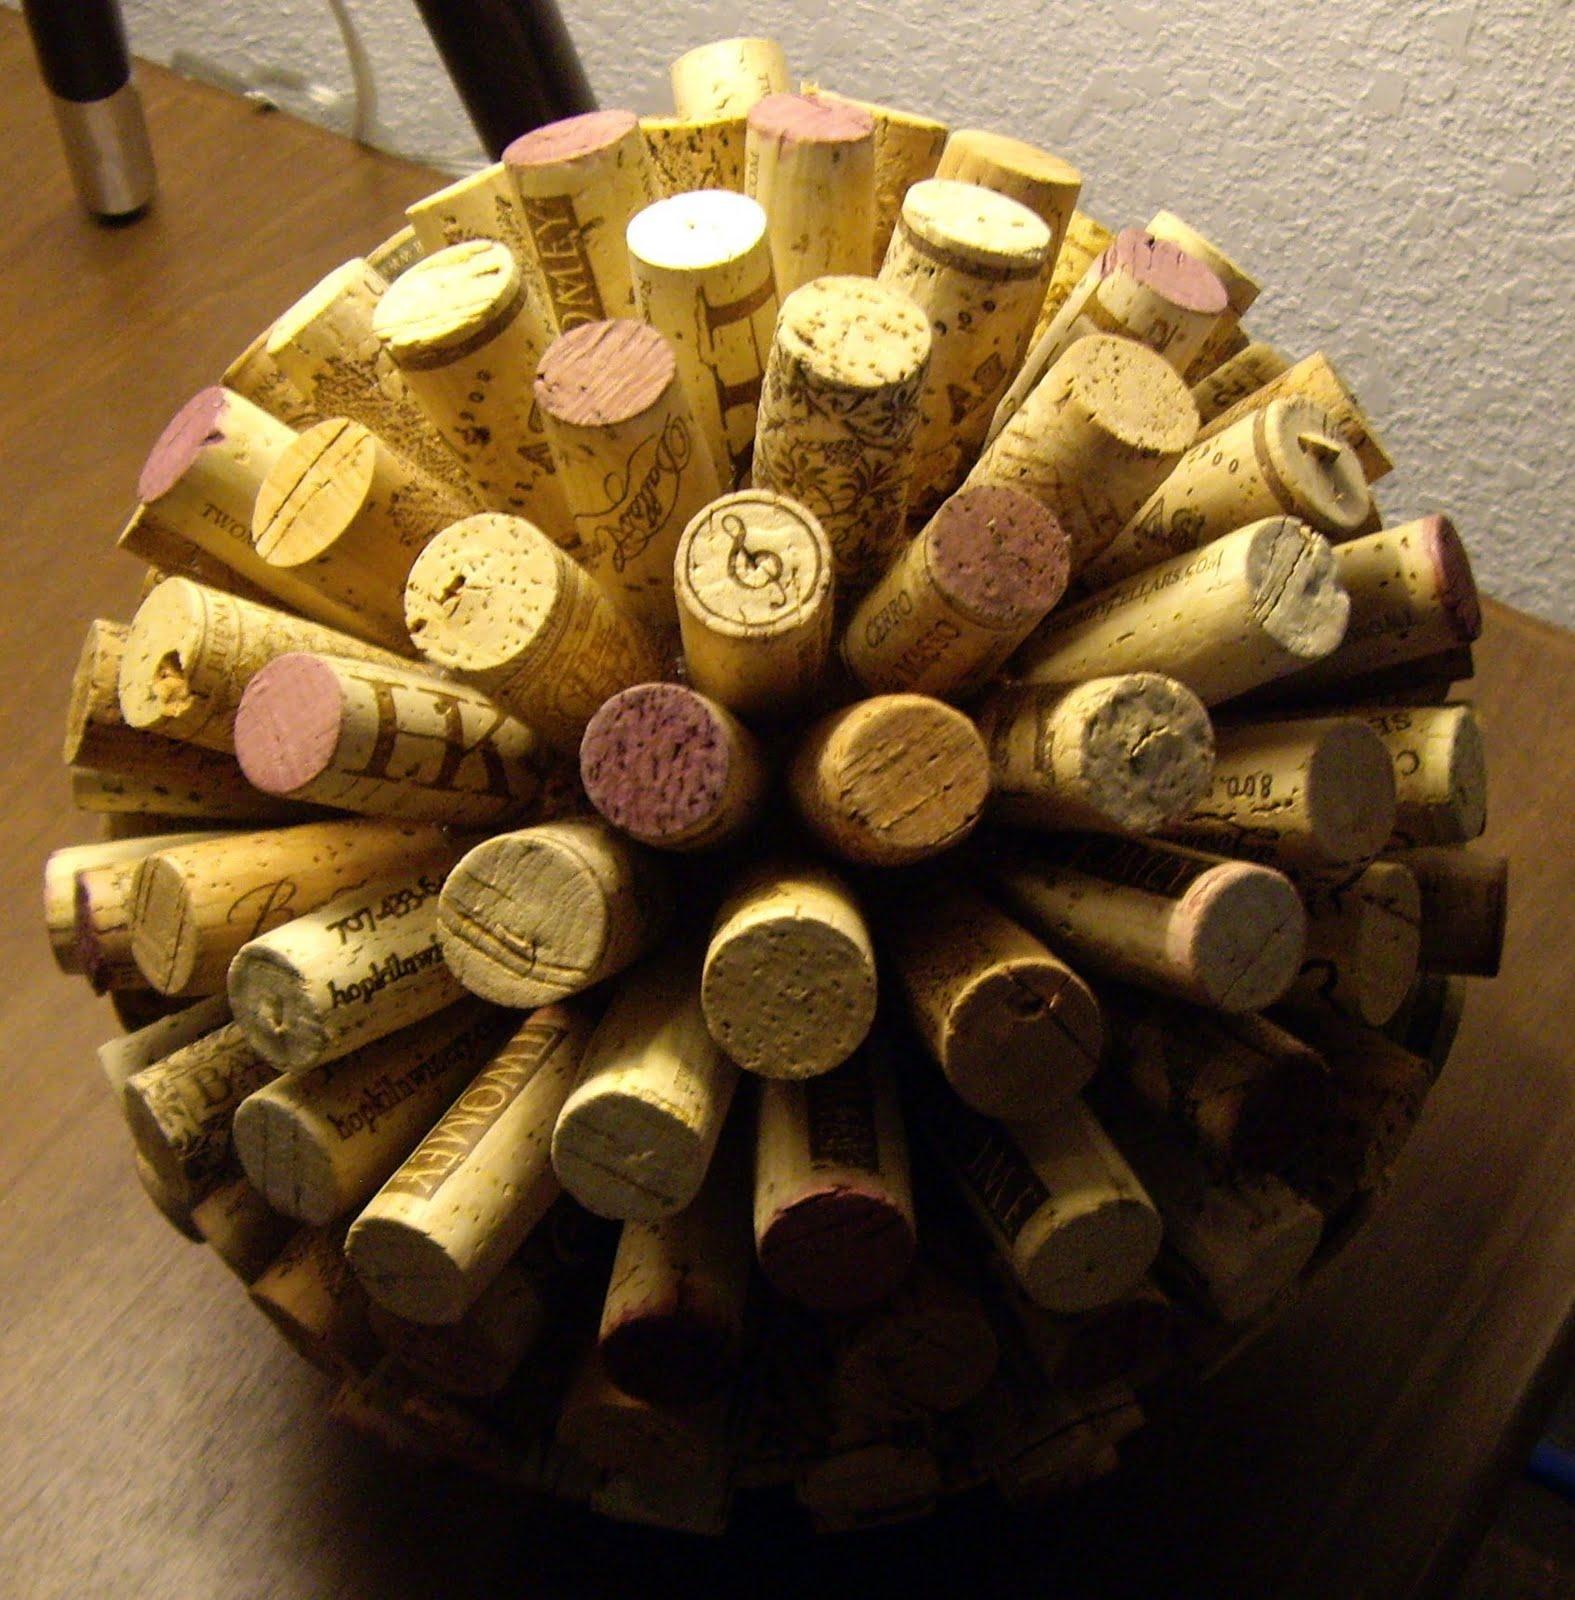 Glam granola pinterest challenge cork balls for Cork balls for crafts